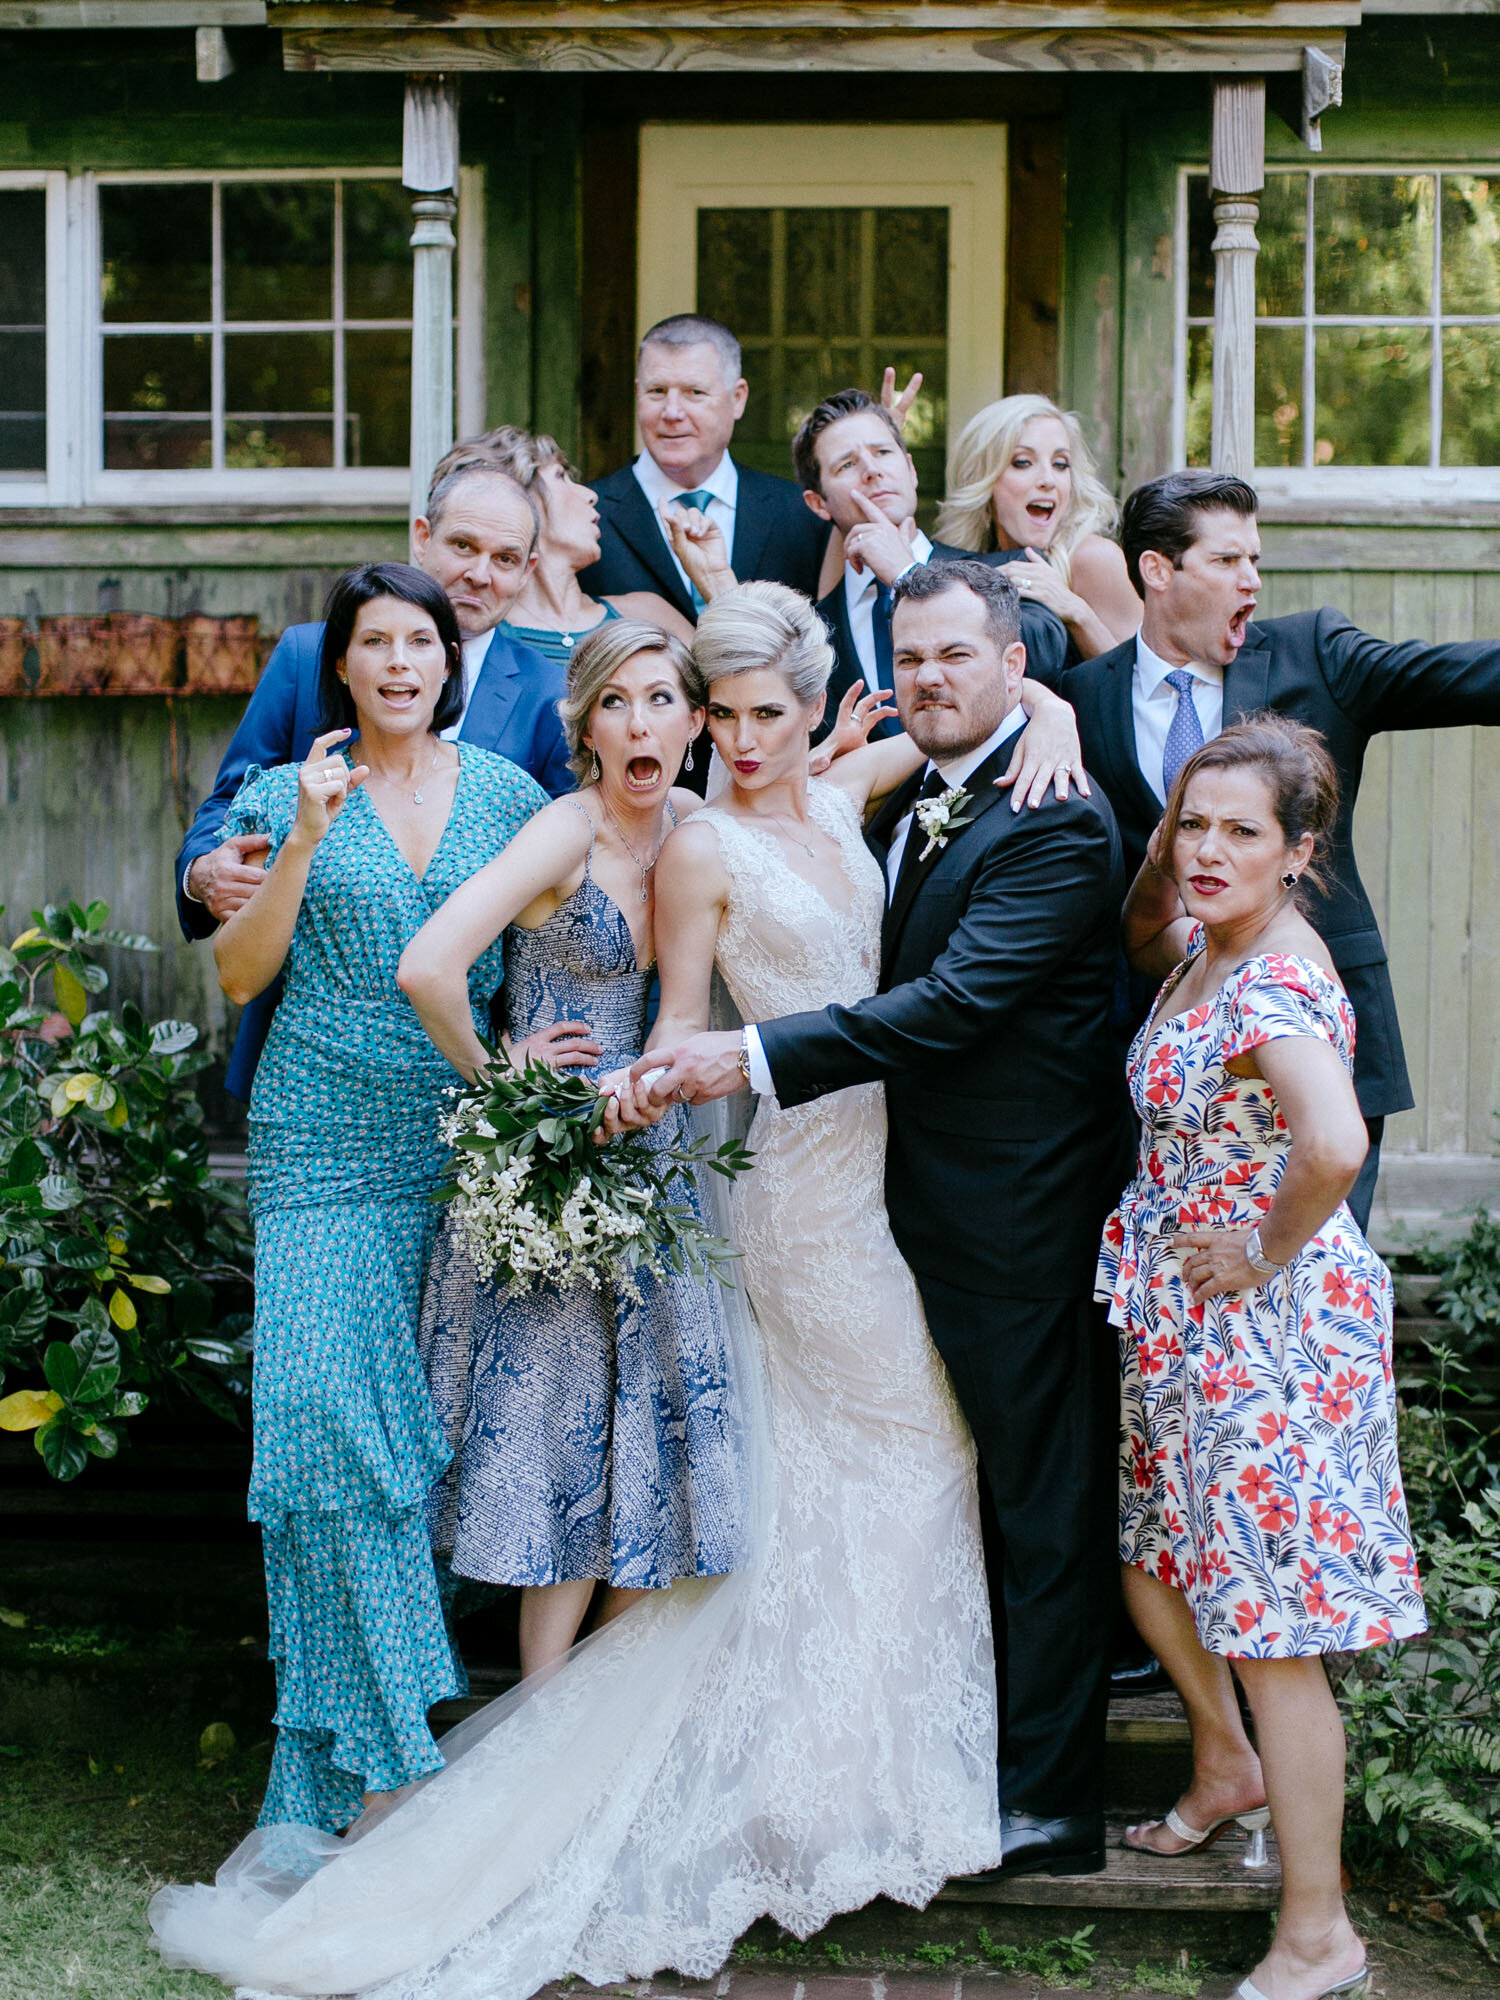 Chris-J-Evans-Maui-Wedding-Kim&Brian3105.jpg